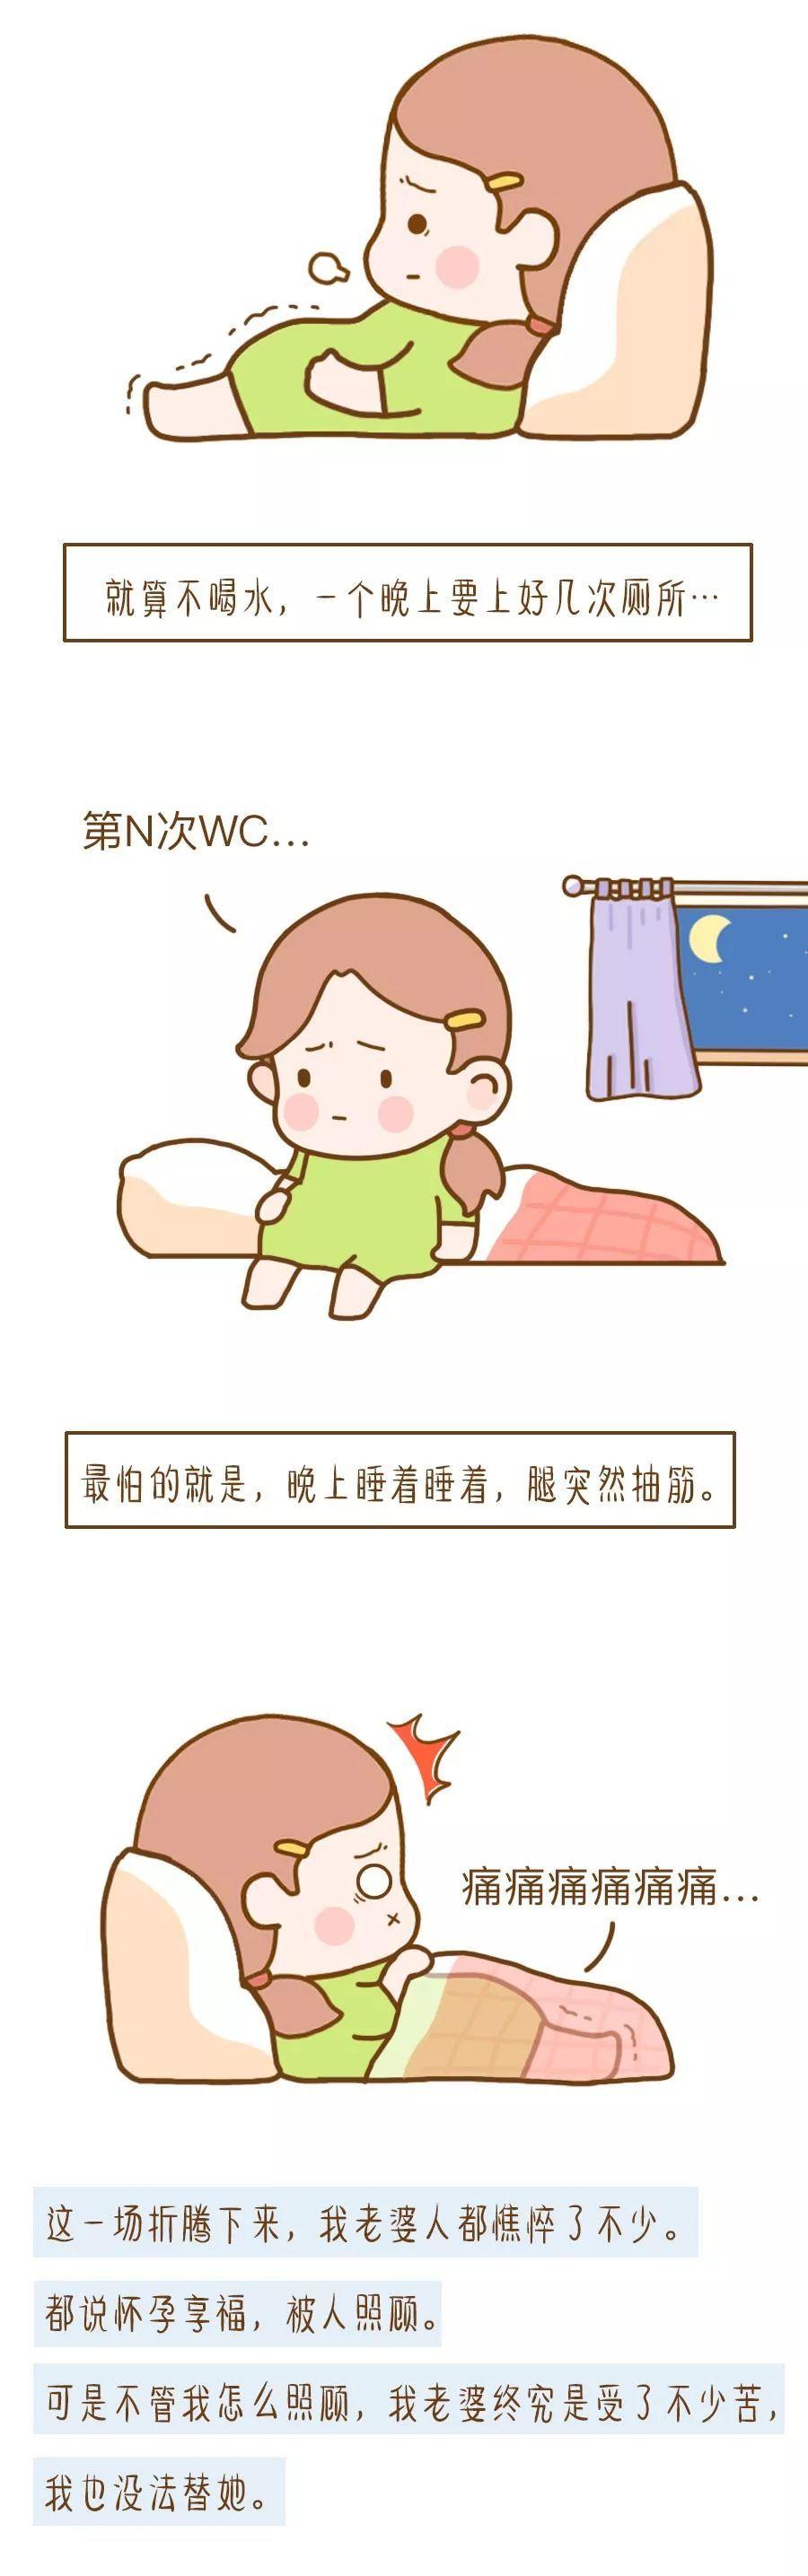 wellbet官方网站登录 5